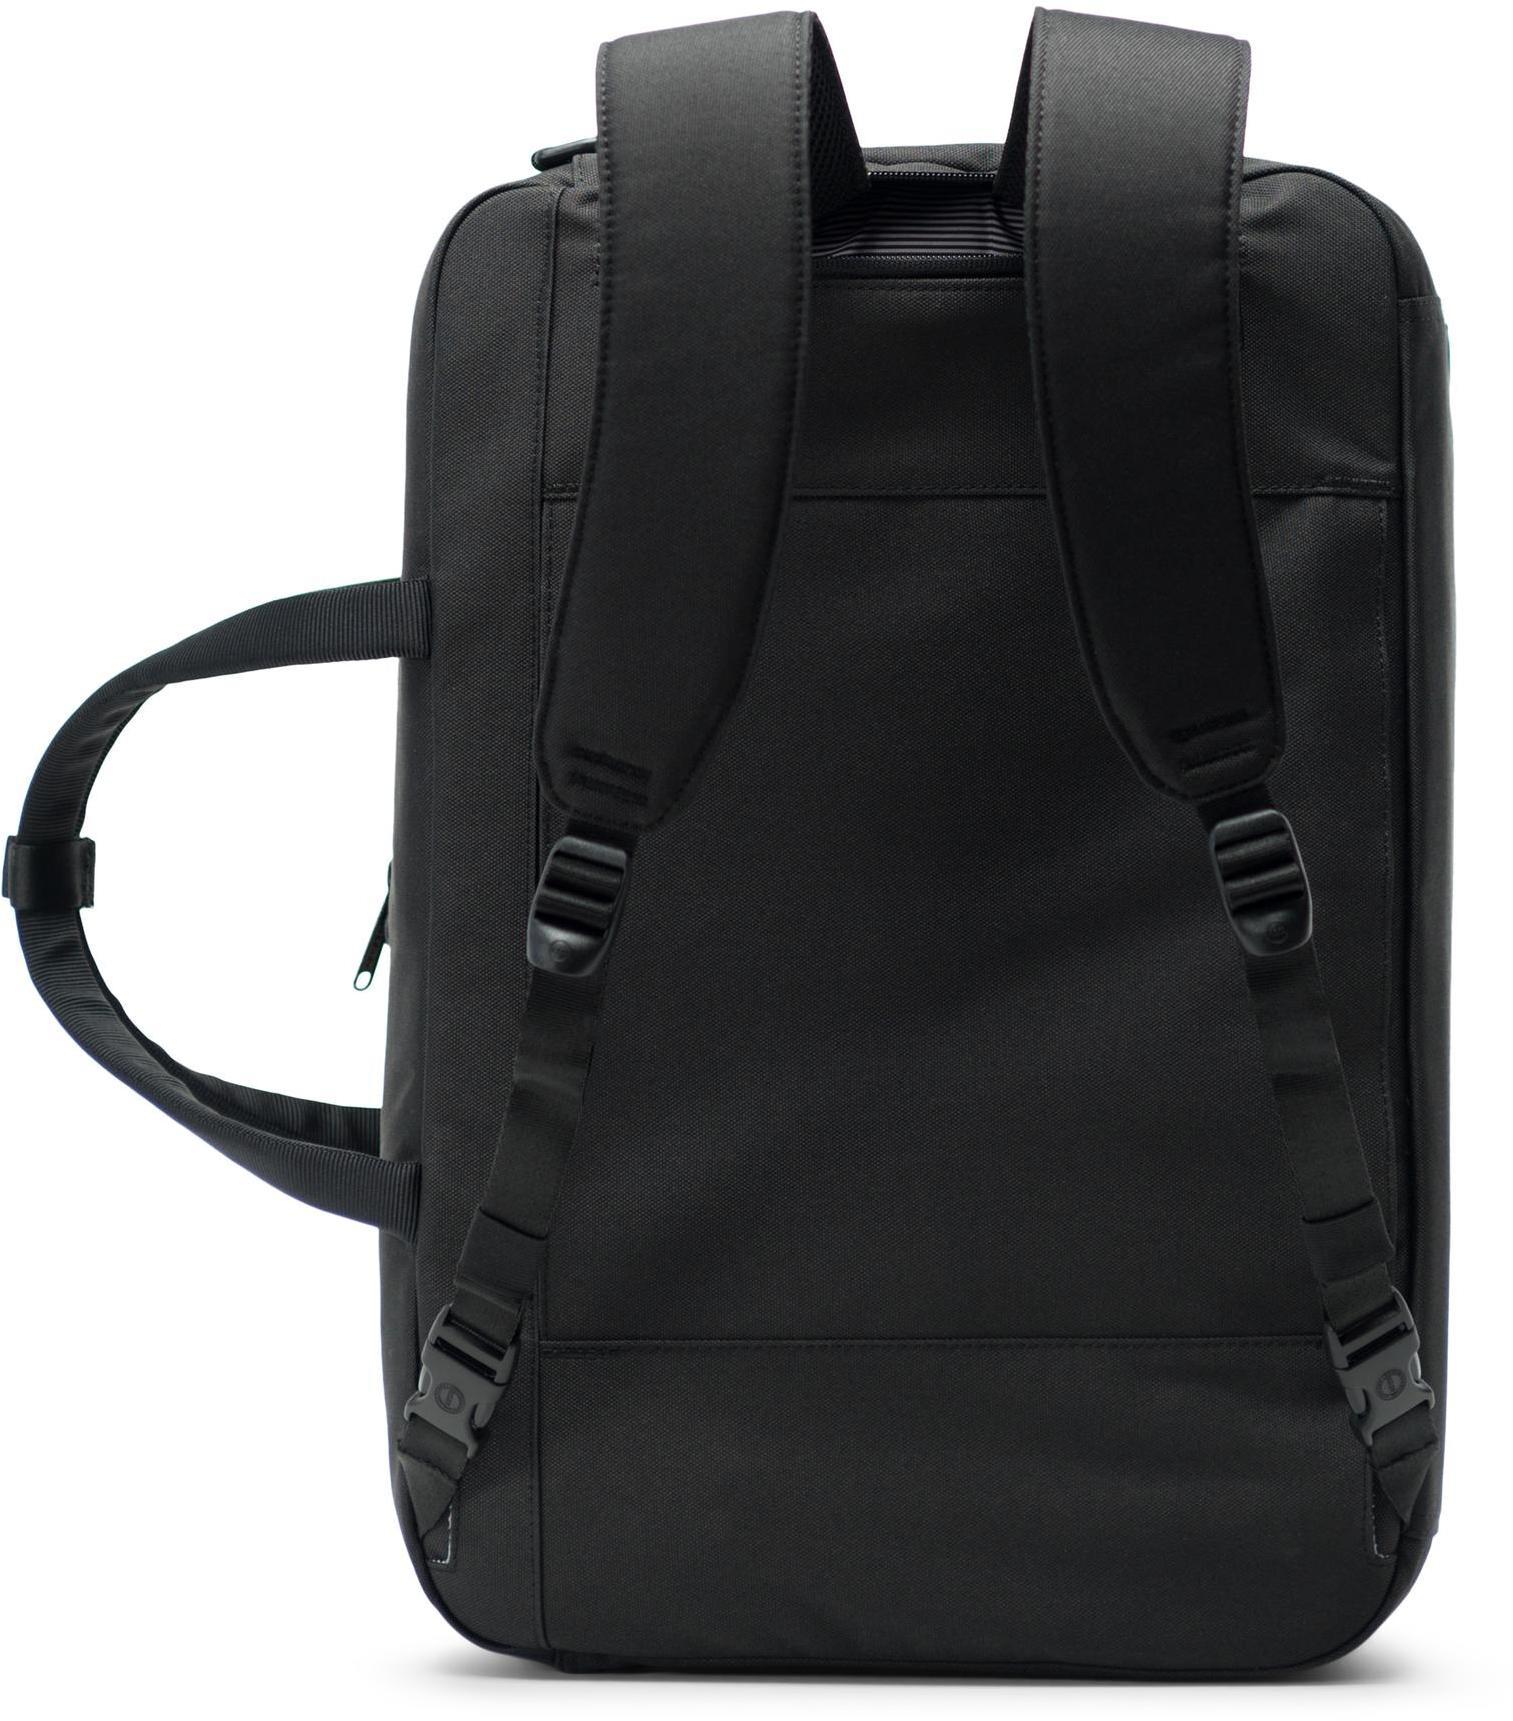 a8c5bc44470c Herschel Bowen Travel Luggage black at Addnature.co.uk